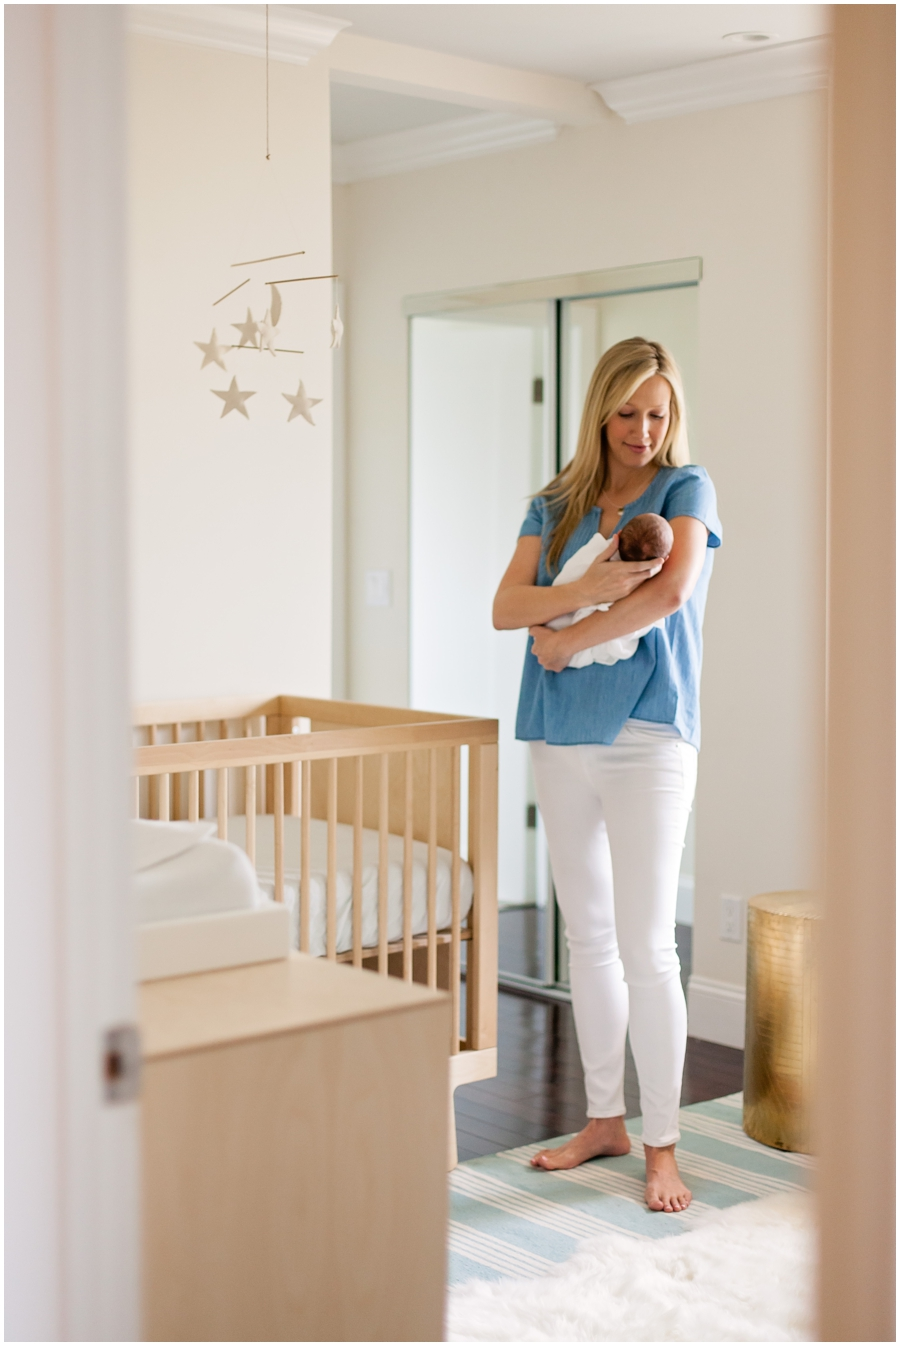 Newborn in Modern Nursery by Just Maggie Photography - Los Angeles Newborn Photographer